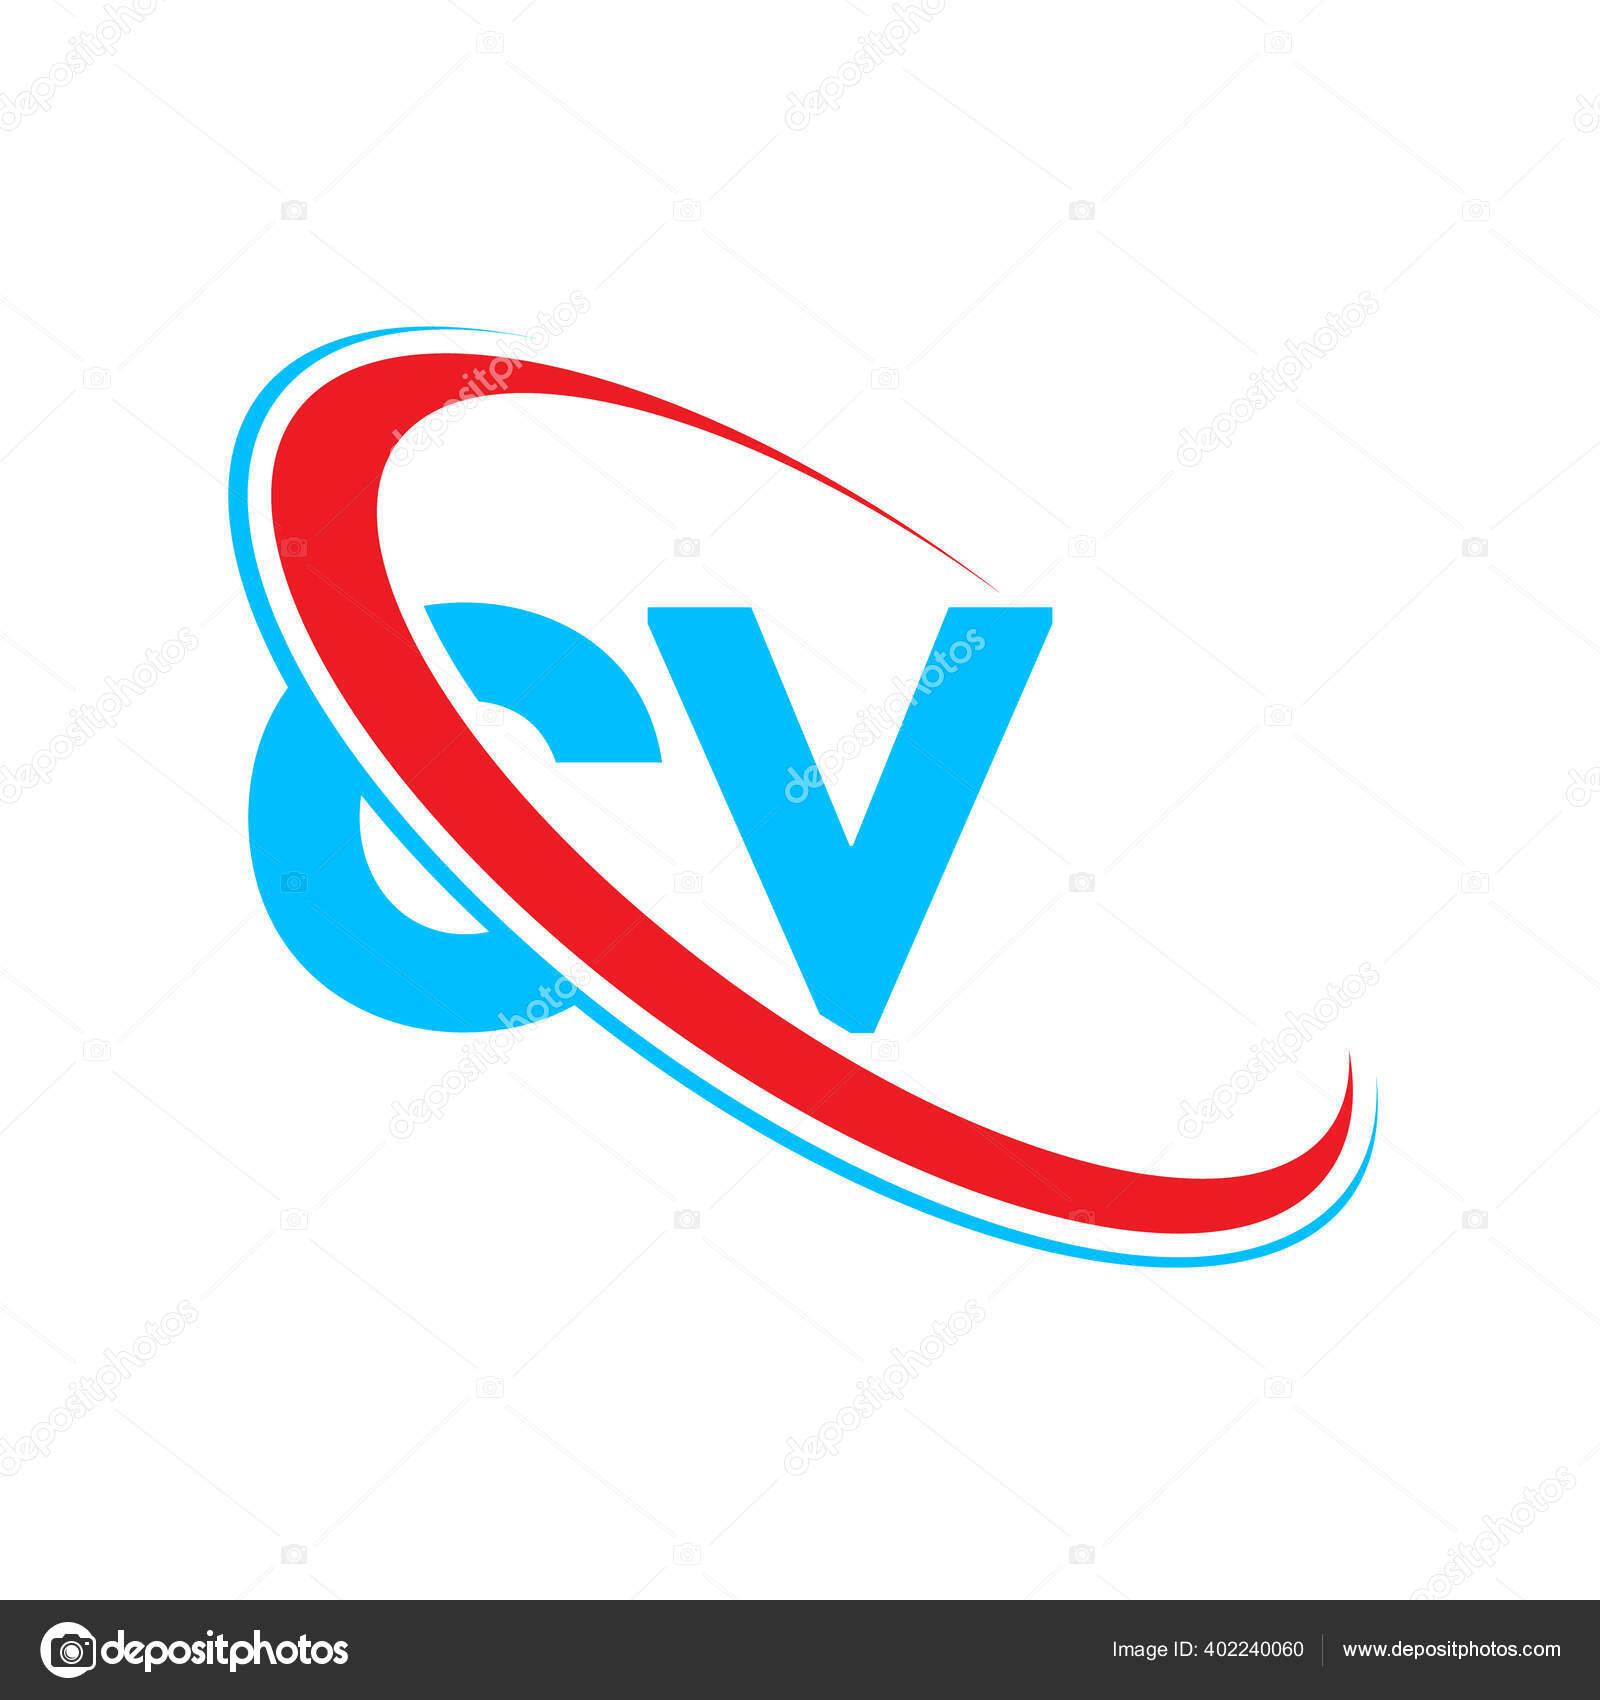 Letter Logo Design Initial Letter Linked Circle Upercase Monogram Logo Vector Image By Mamuntwofiveg Vector Stock 402240060